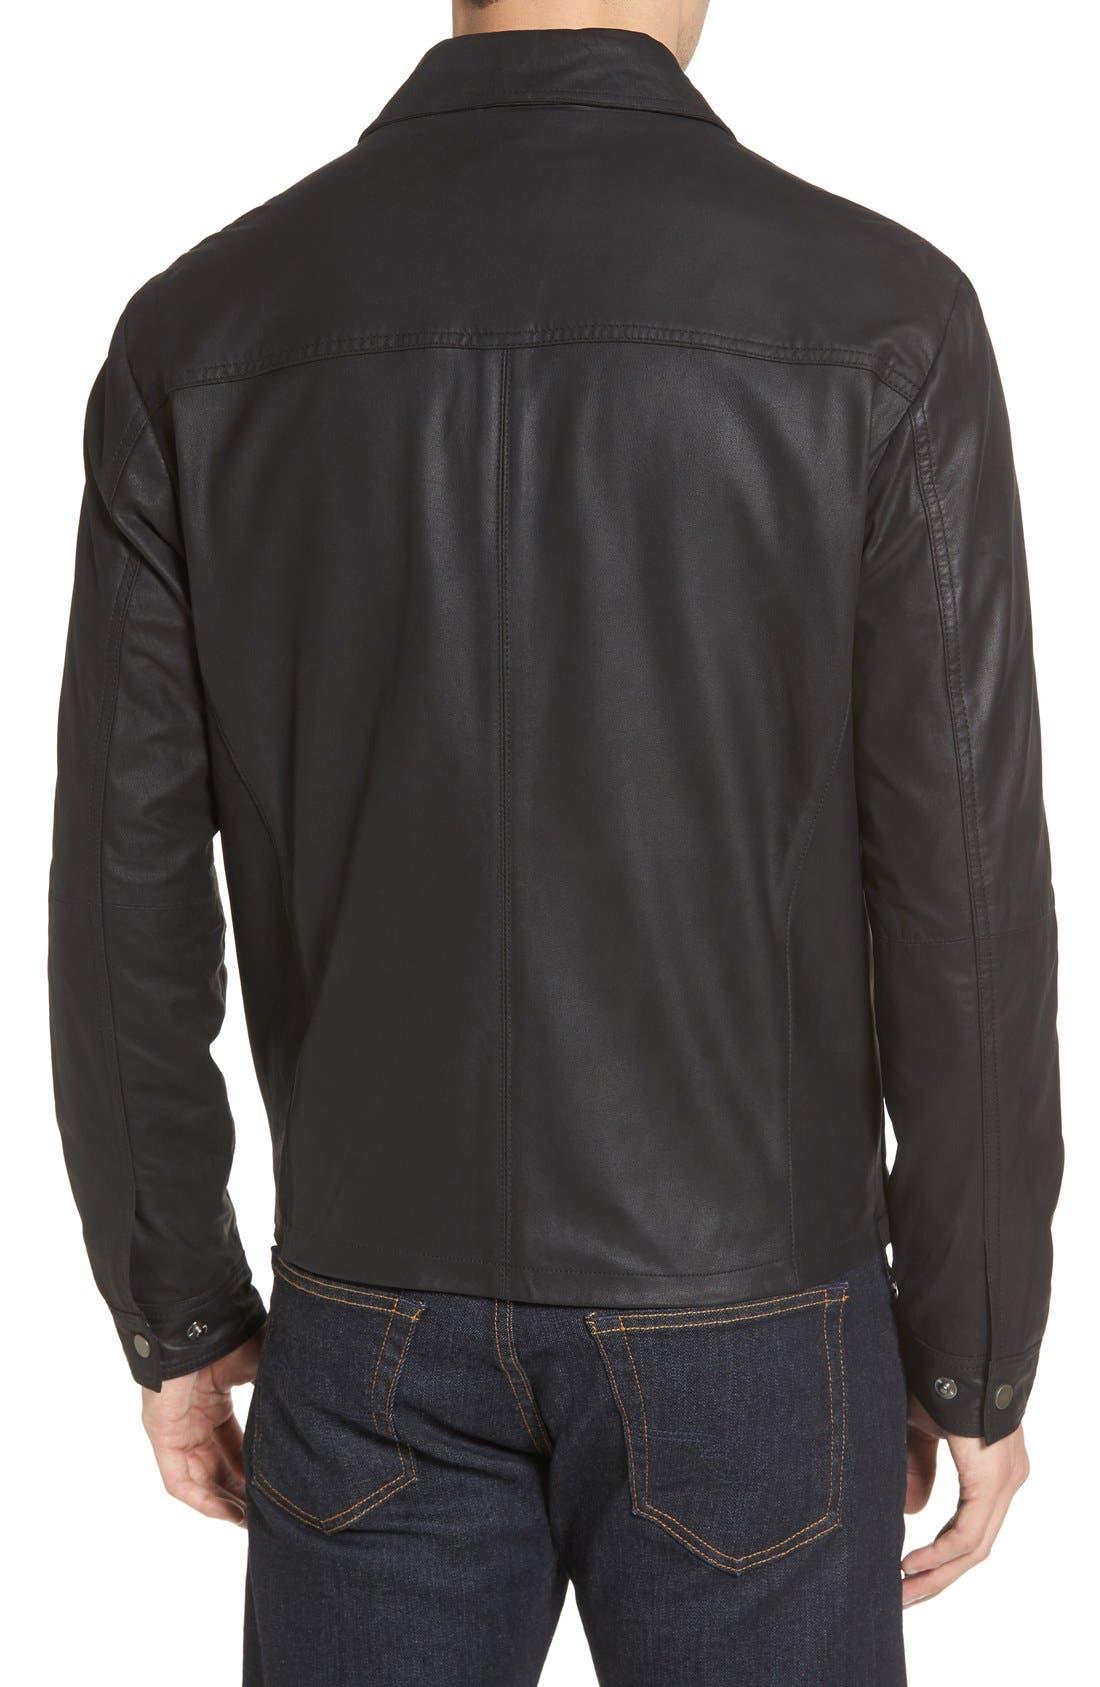 MissaniLe CollezioniLambskin Leather Jacket,                             Alternate thumbnail 2, color,                             Black